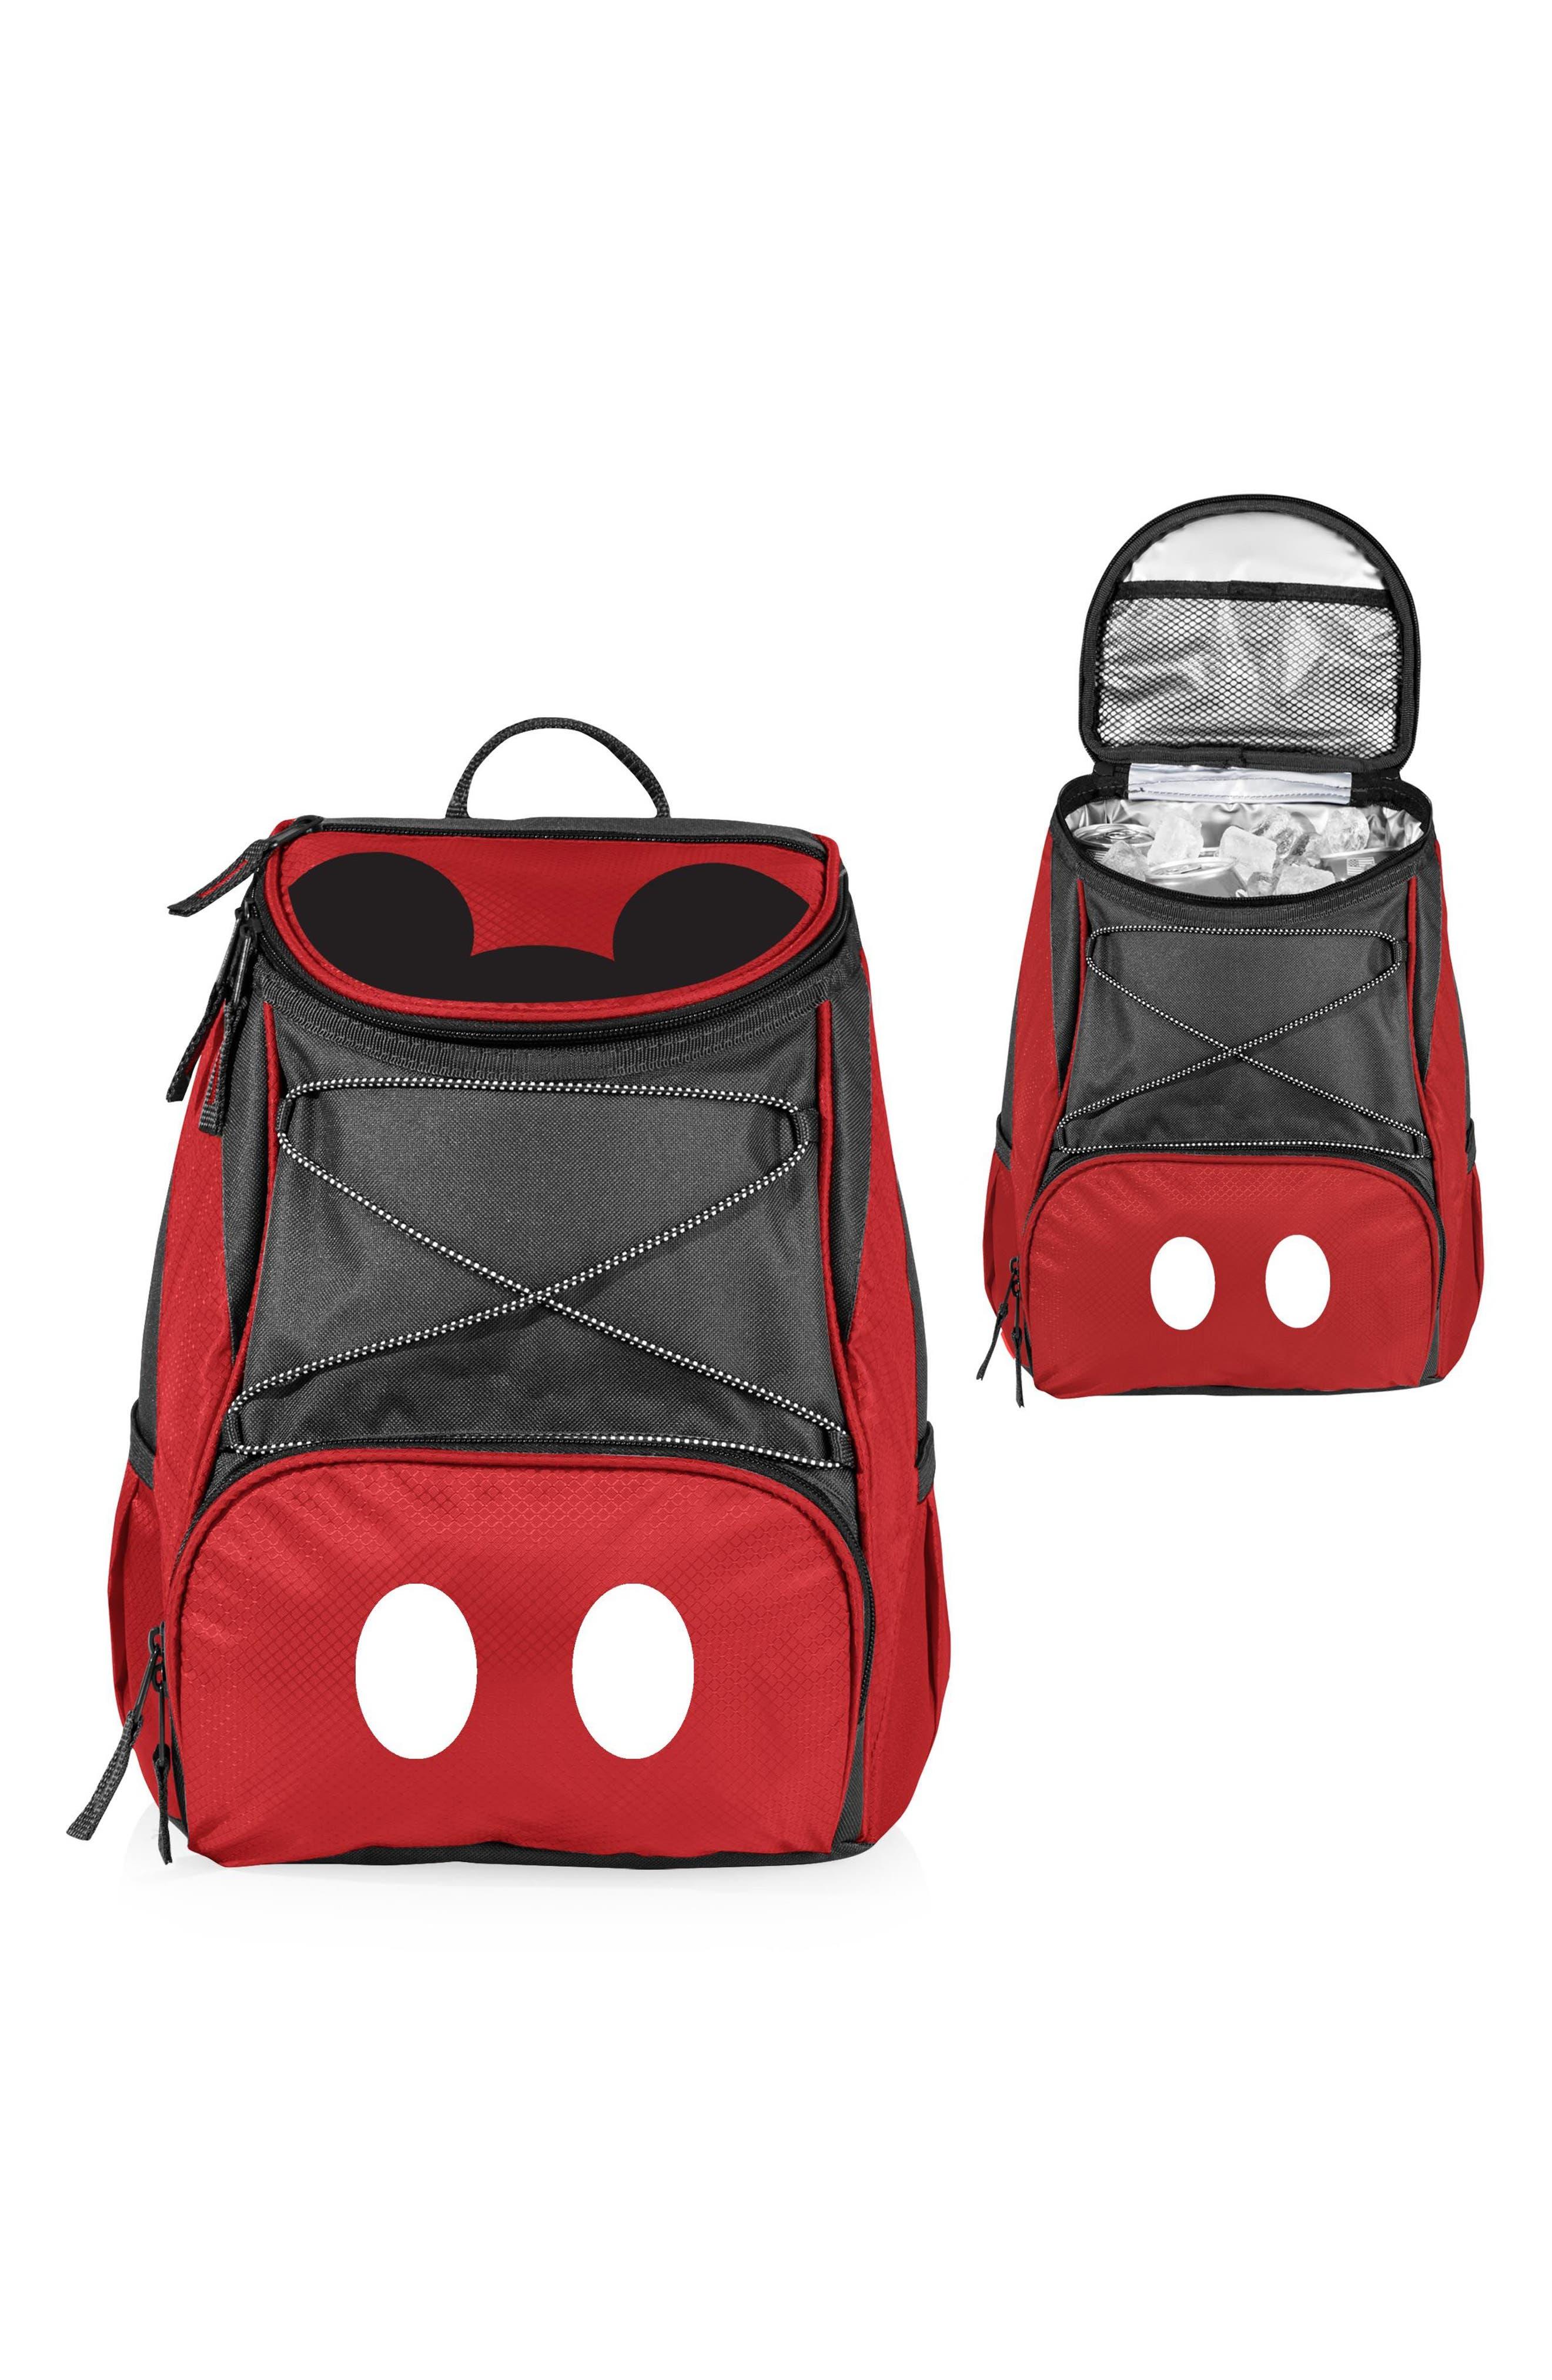 PTX - Disney Water Resistant Backpack Cooler,                             Alternate thumbnail 3, color,                             RED